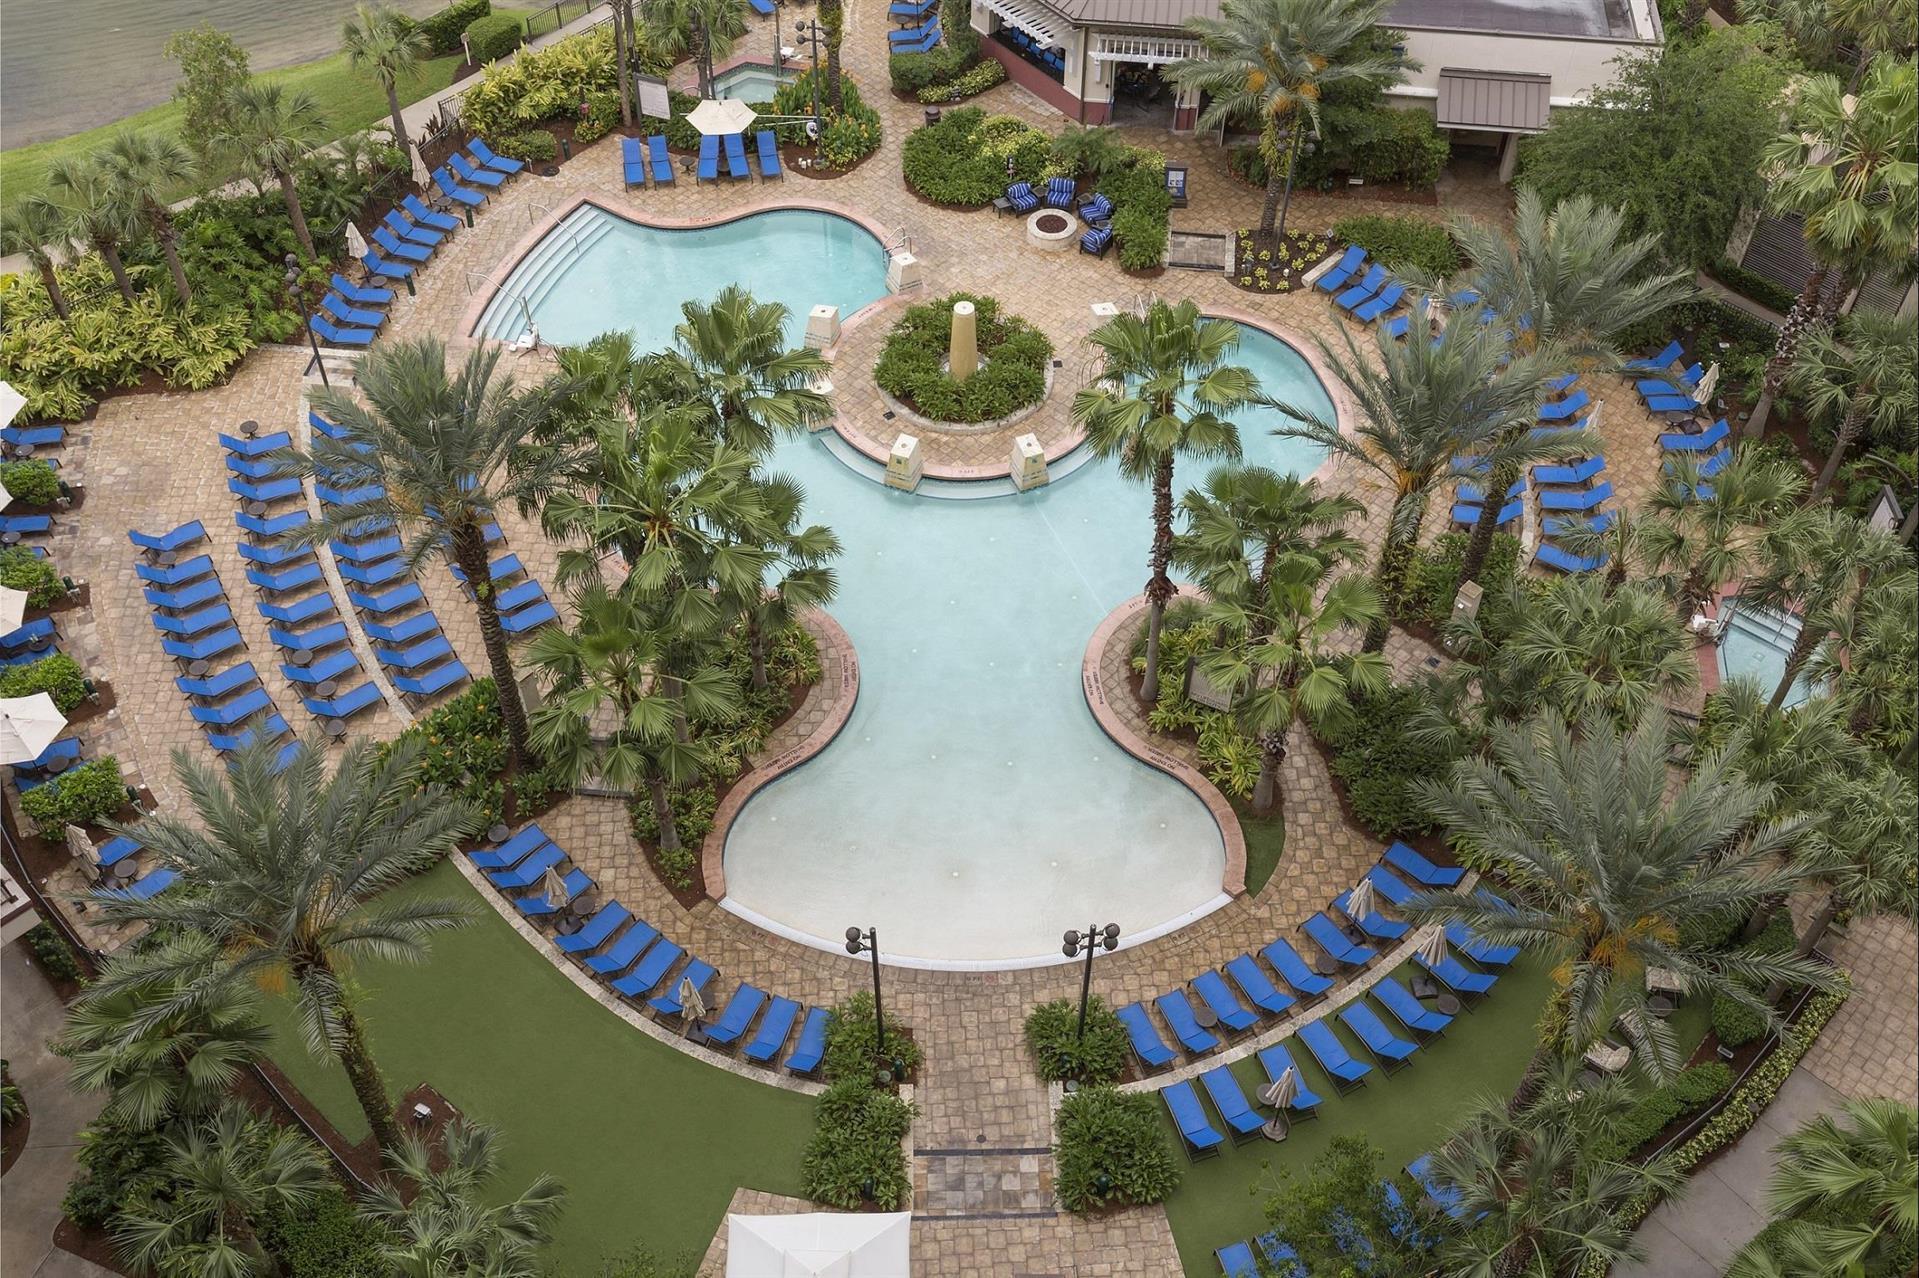 Meetings and Events at Wyndham Grand Orlando Bonnet Creek, Orlando ...